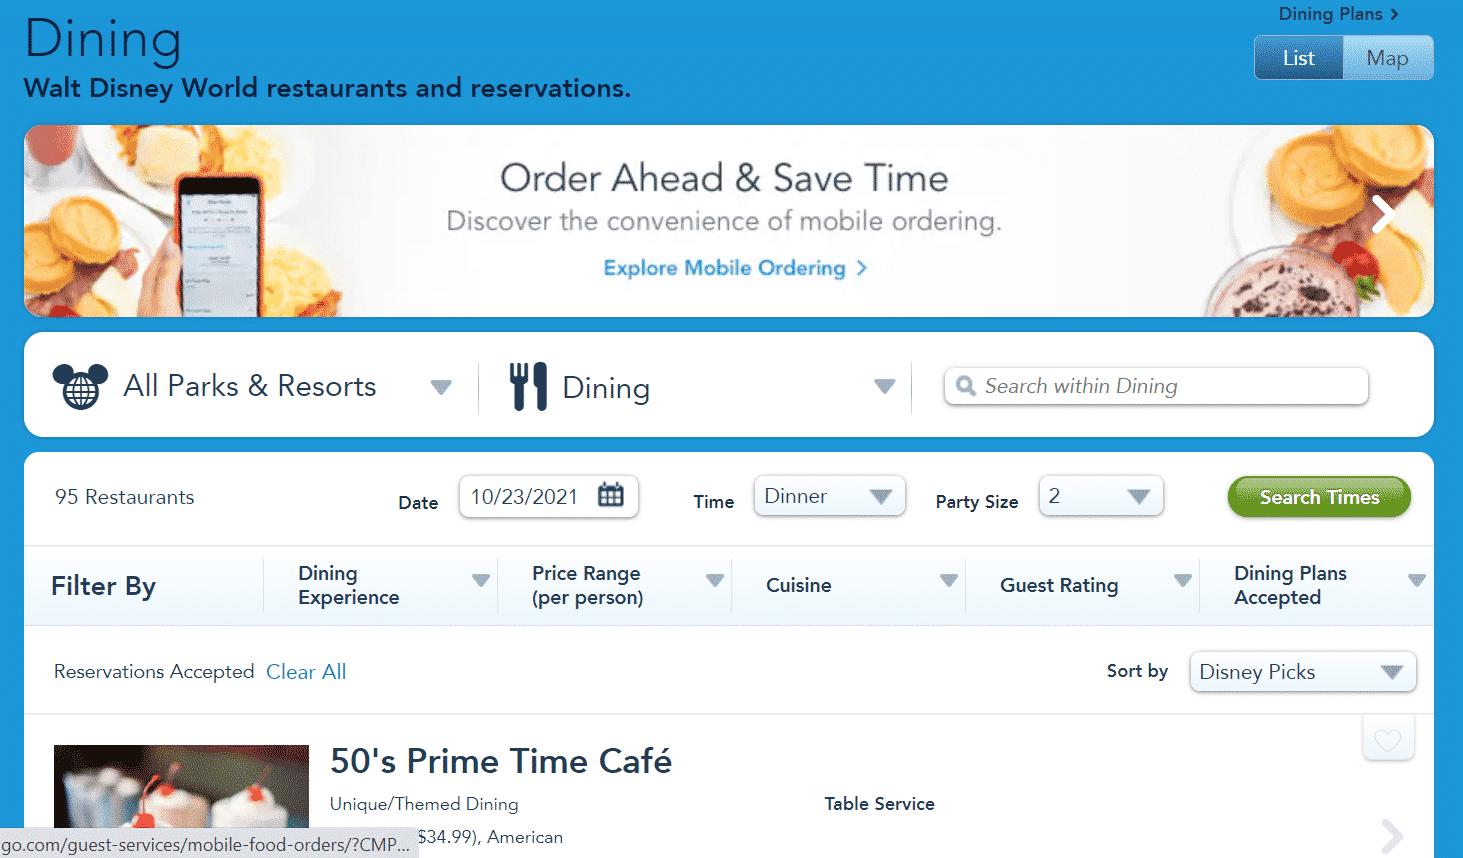 disney dining reservations